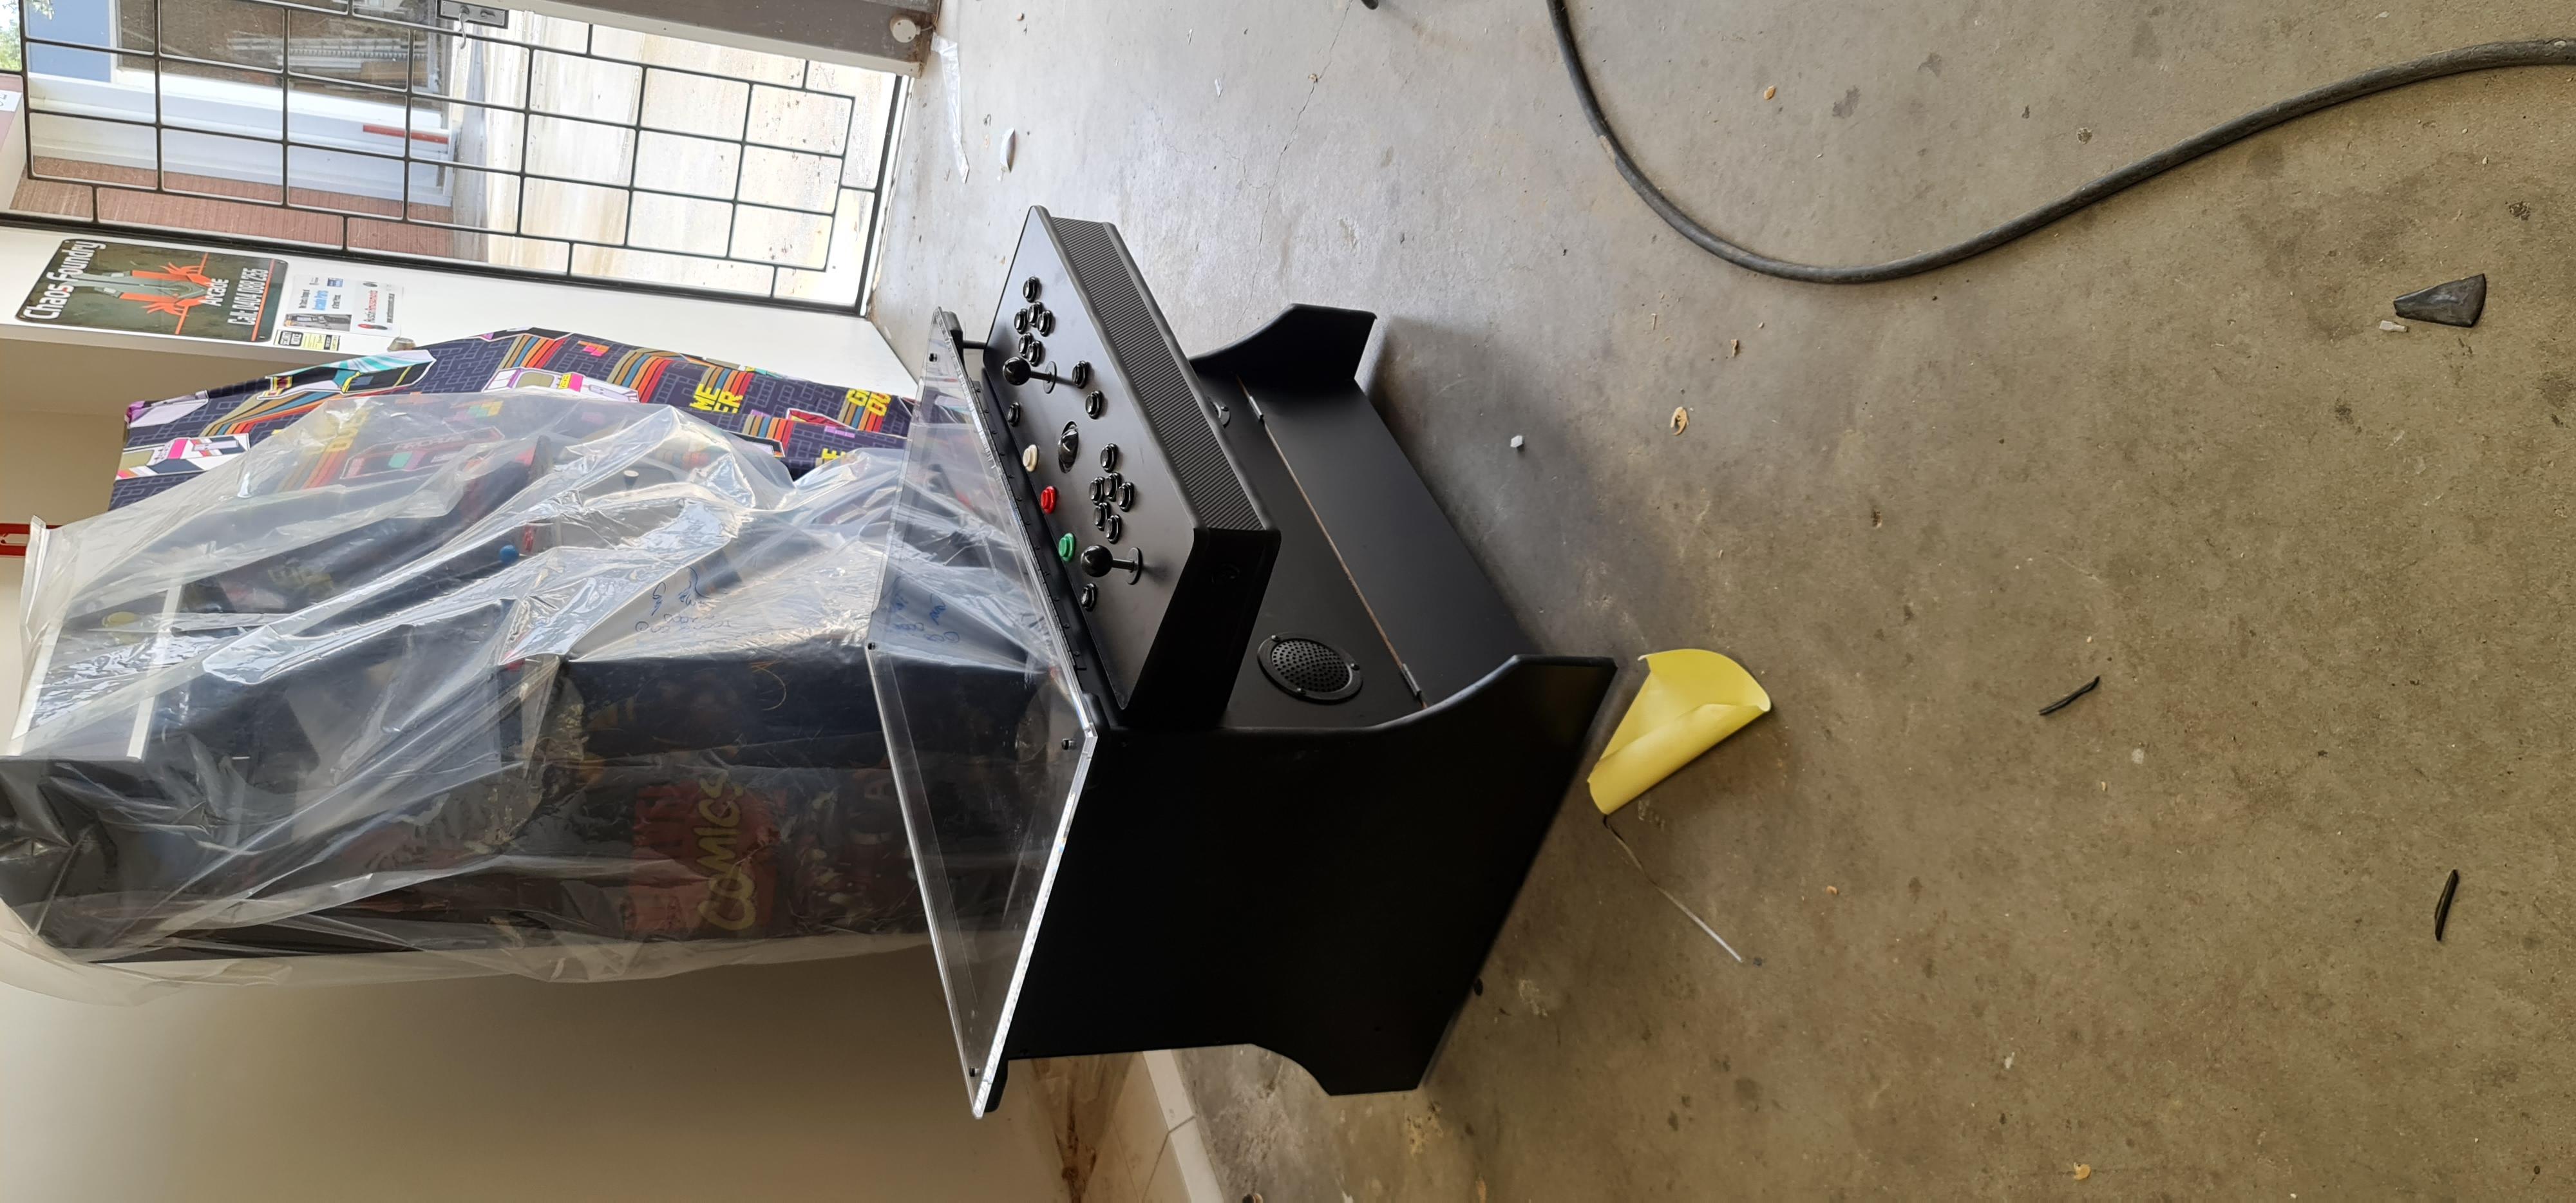 Coffee table arcade 32 inch